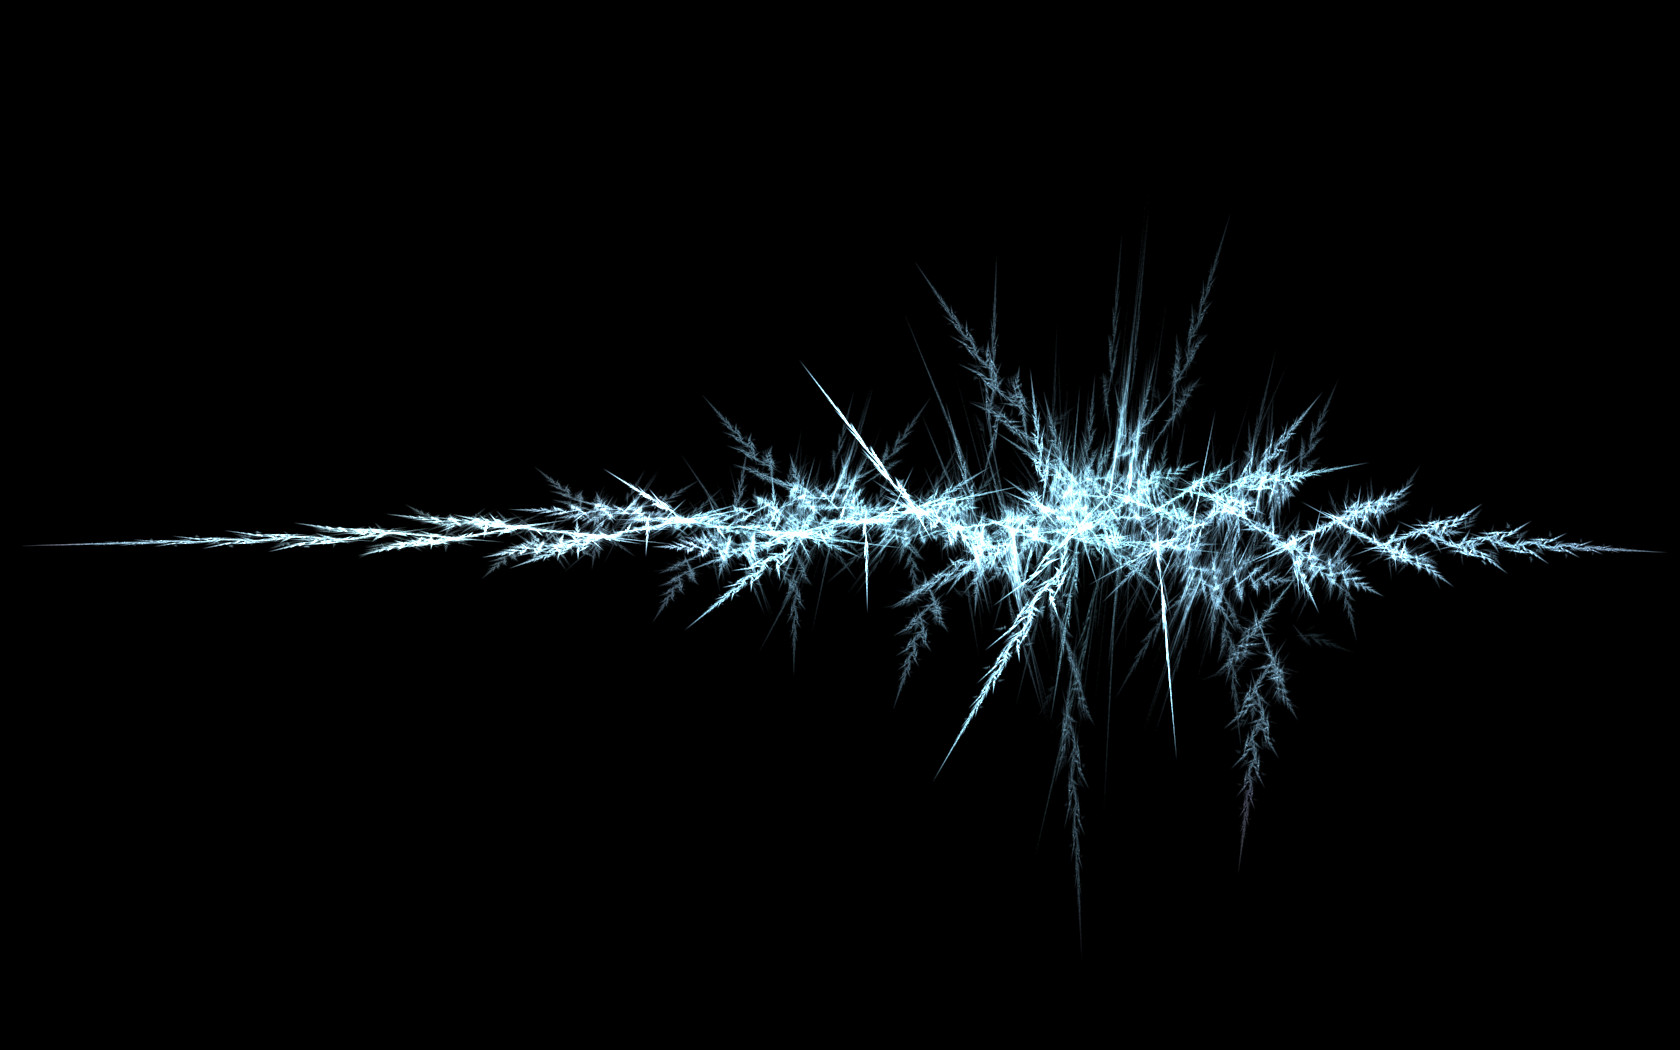 Free Glow In The Dark Wallpaper 27045 1680x1050px